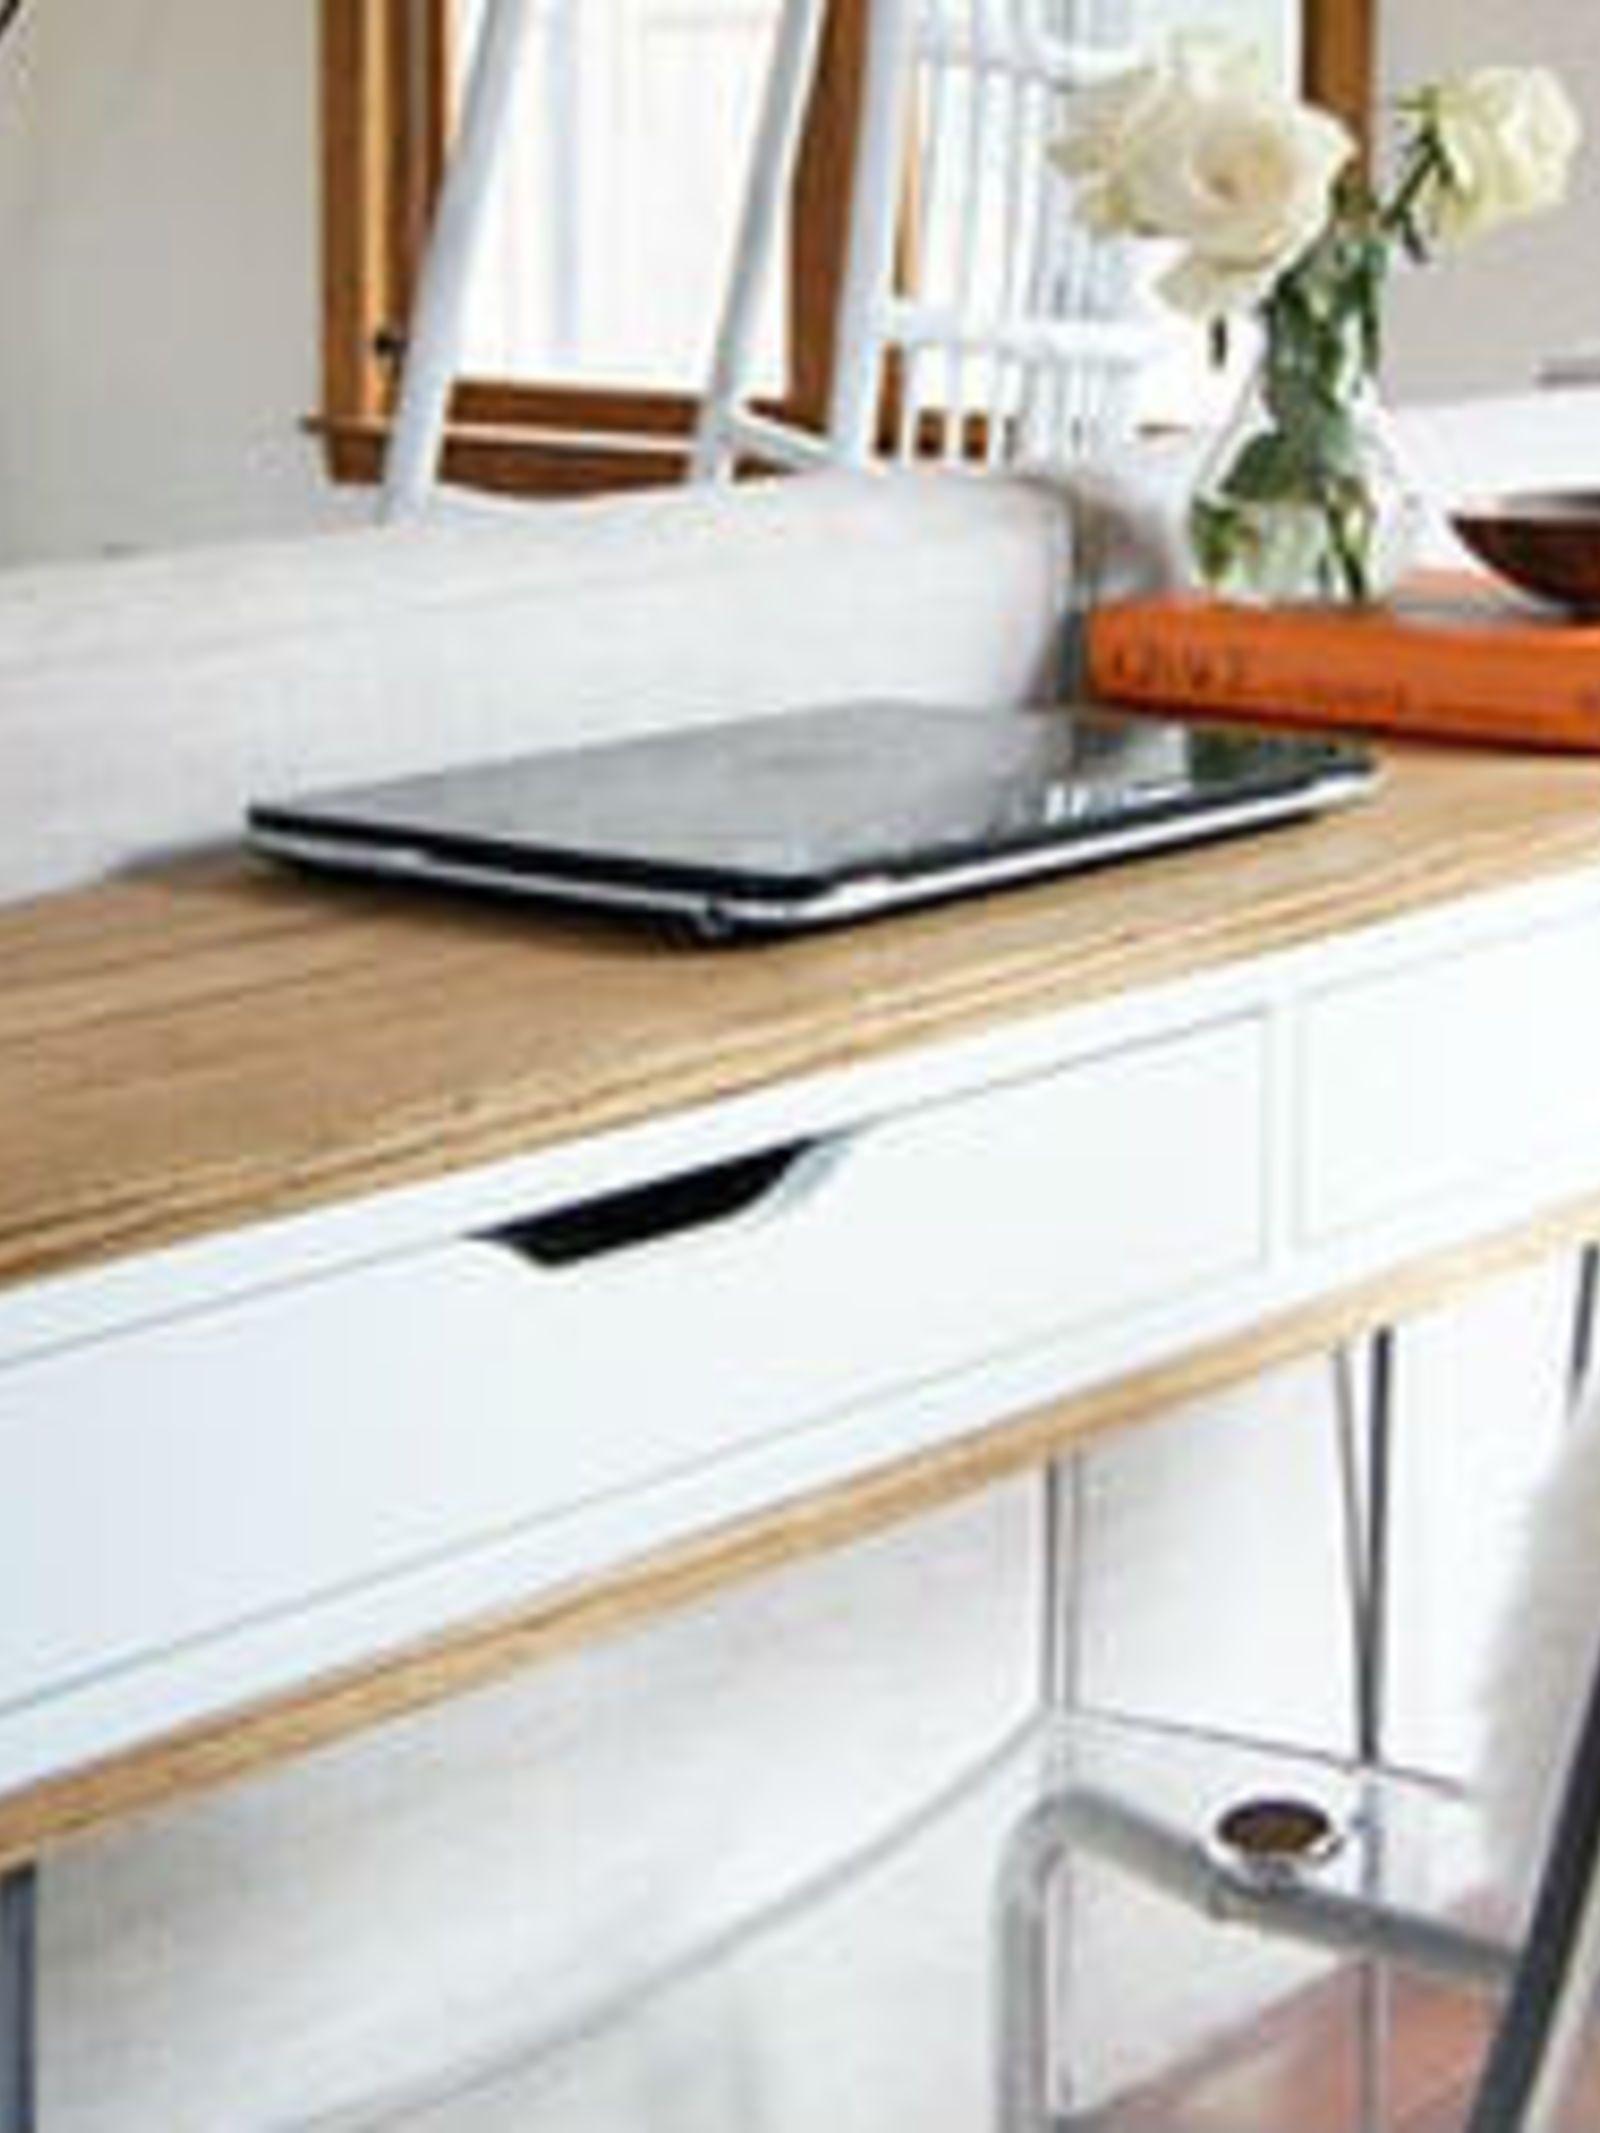 ikea hack van wandplank tot retro bureau renovatie kamer keuken retro desk desk en laptop desk. Black Bedroom Furniture Sets. Home Design Ideas